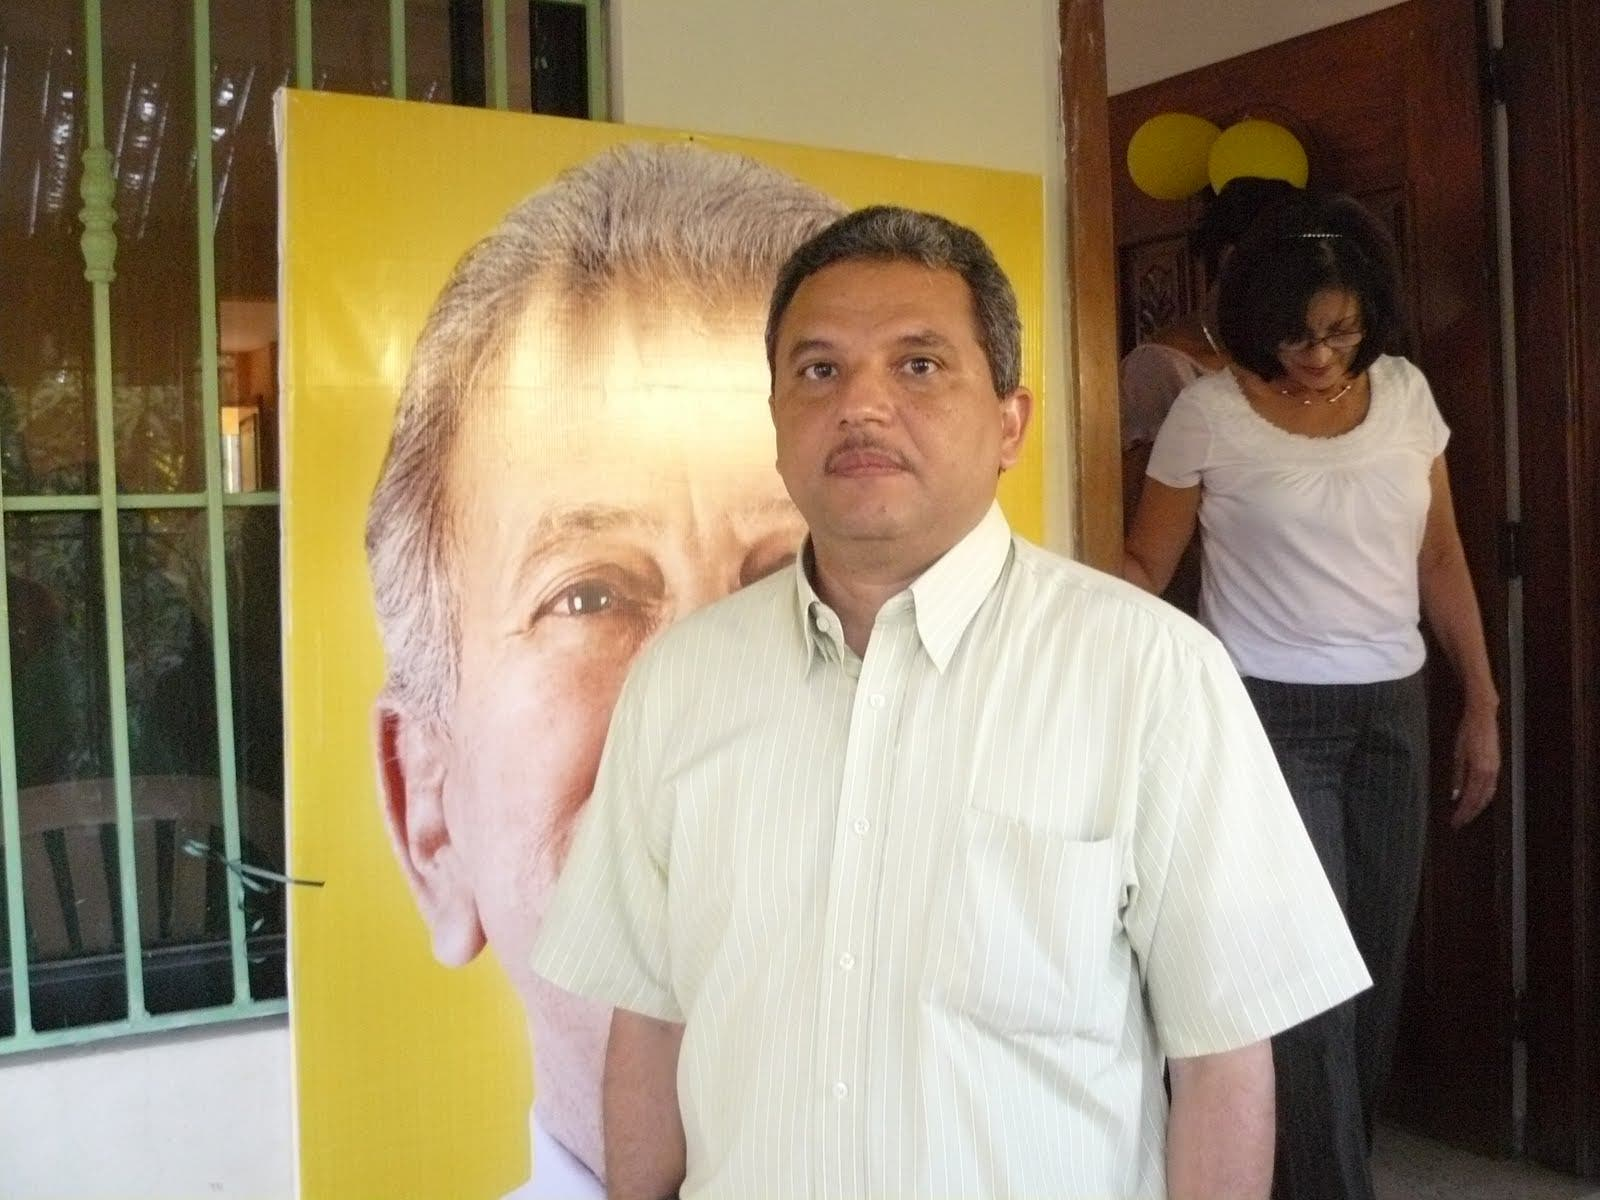 Advierte protestarían en las calles contra reelección de Danilo Medina